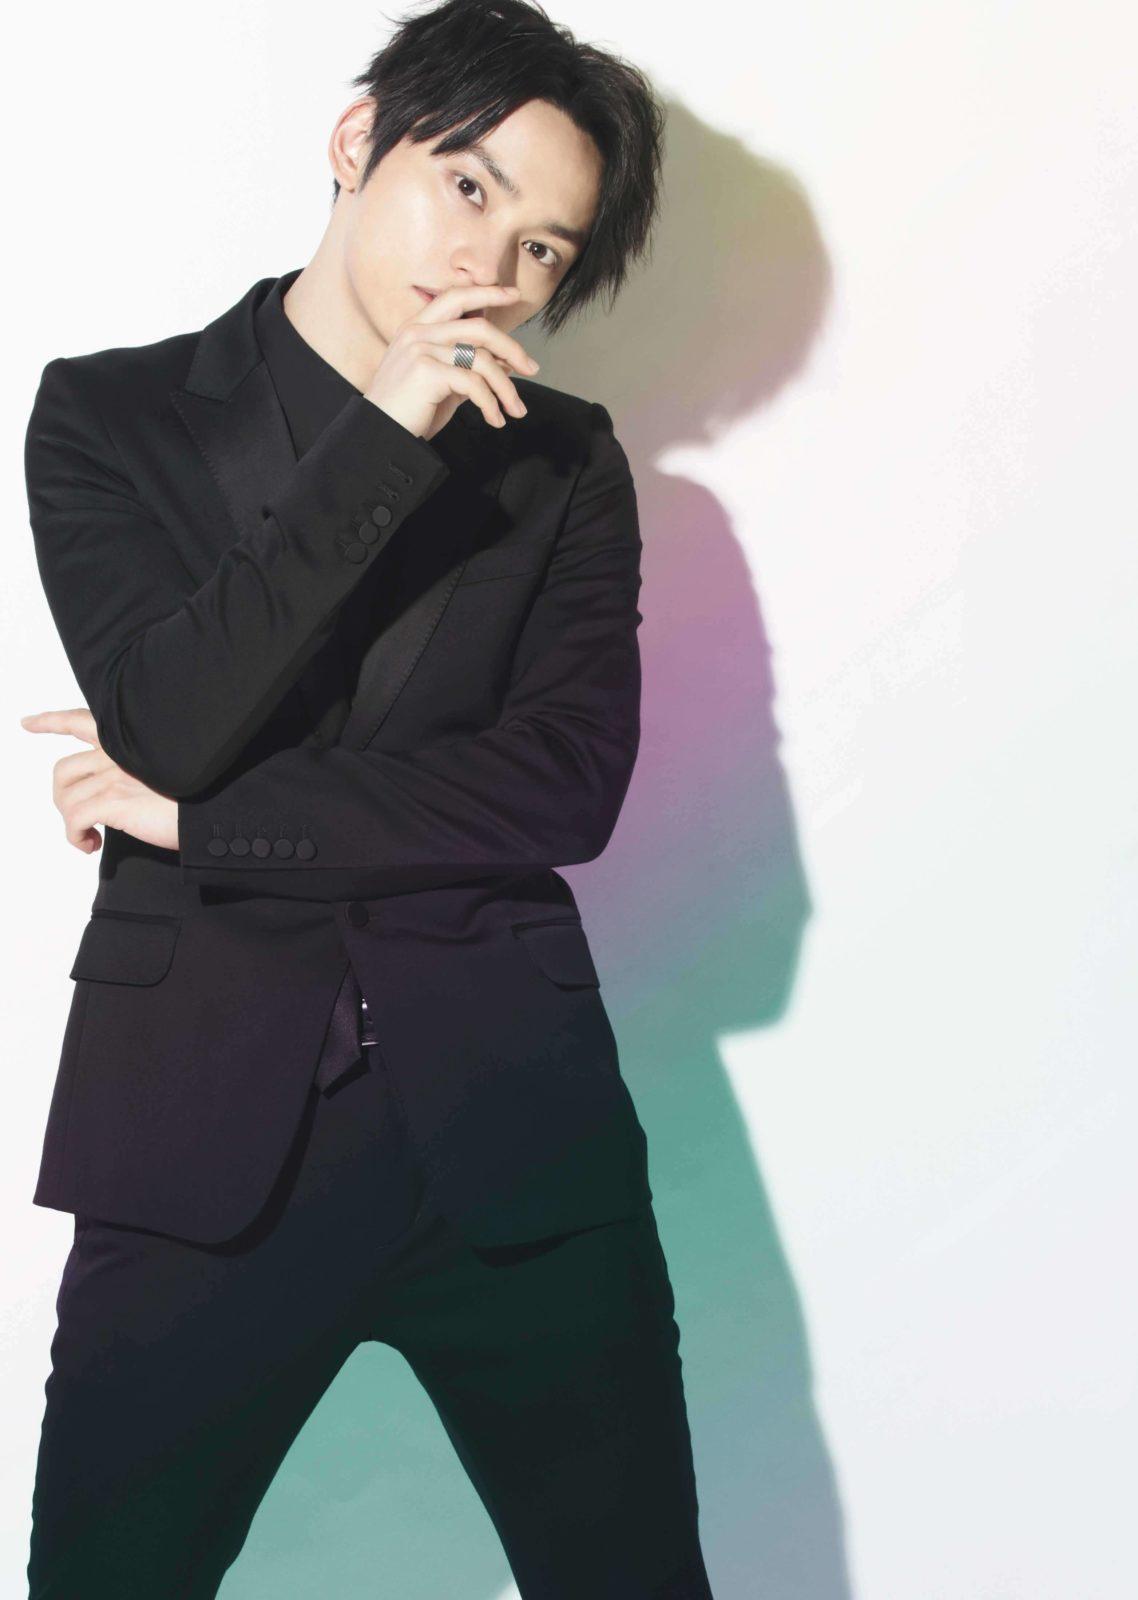 SKY-HI、約2年ぶりのオリジナルアルバムの発売と公開レコーディングが決定サムネイル画像